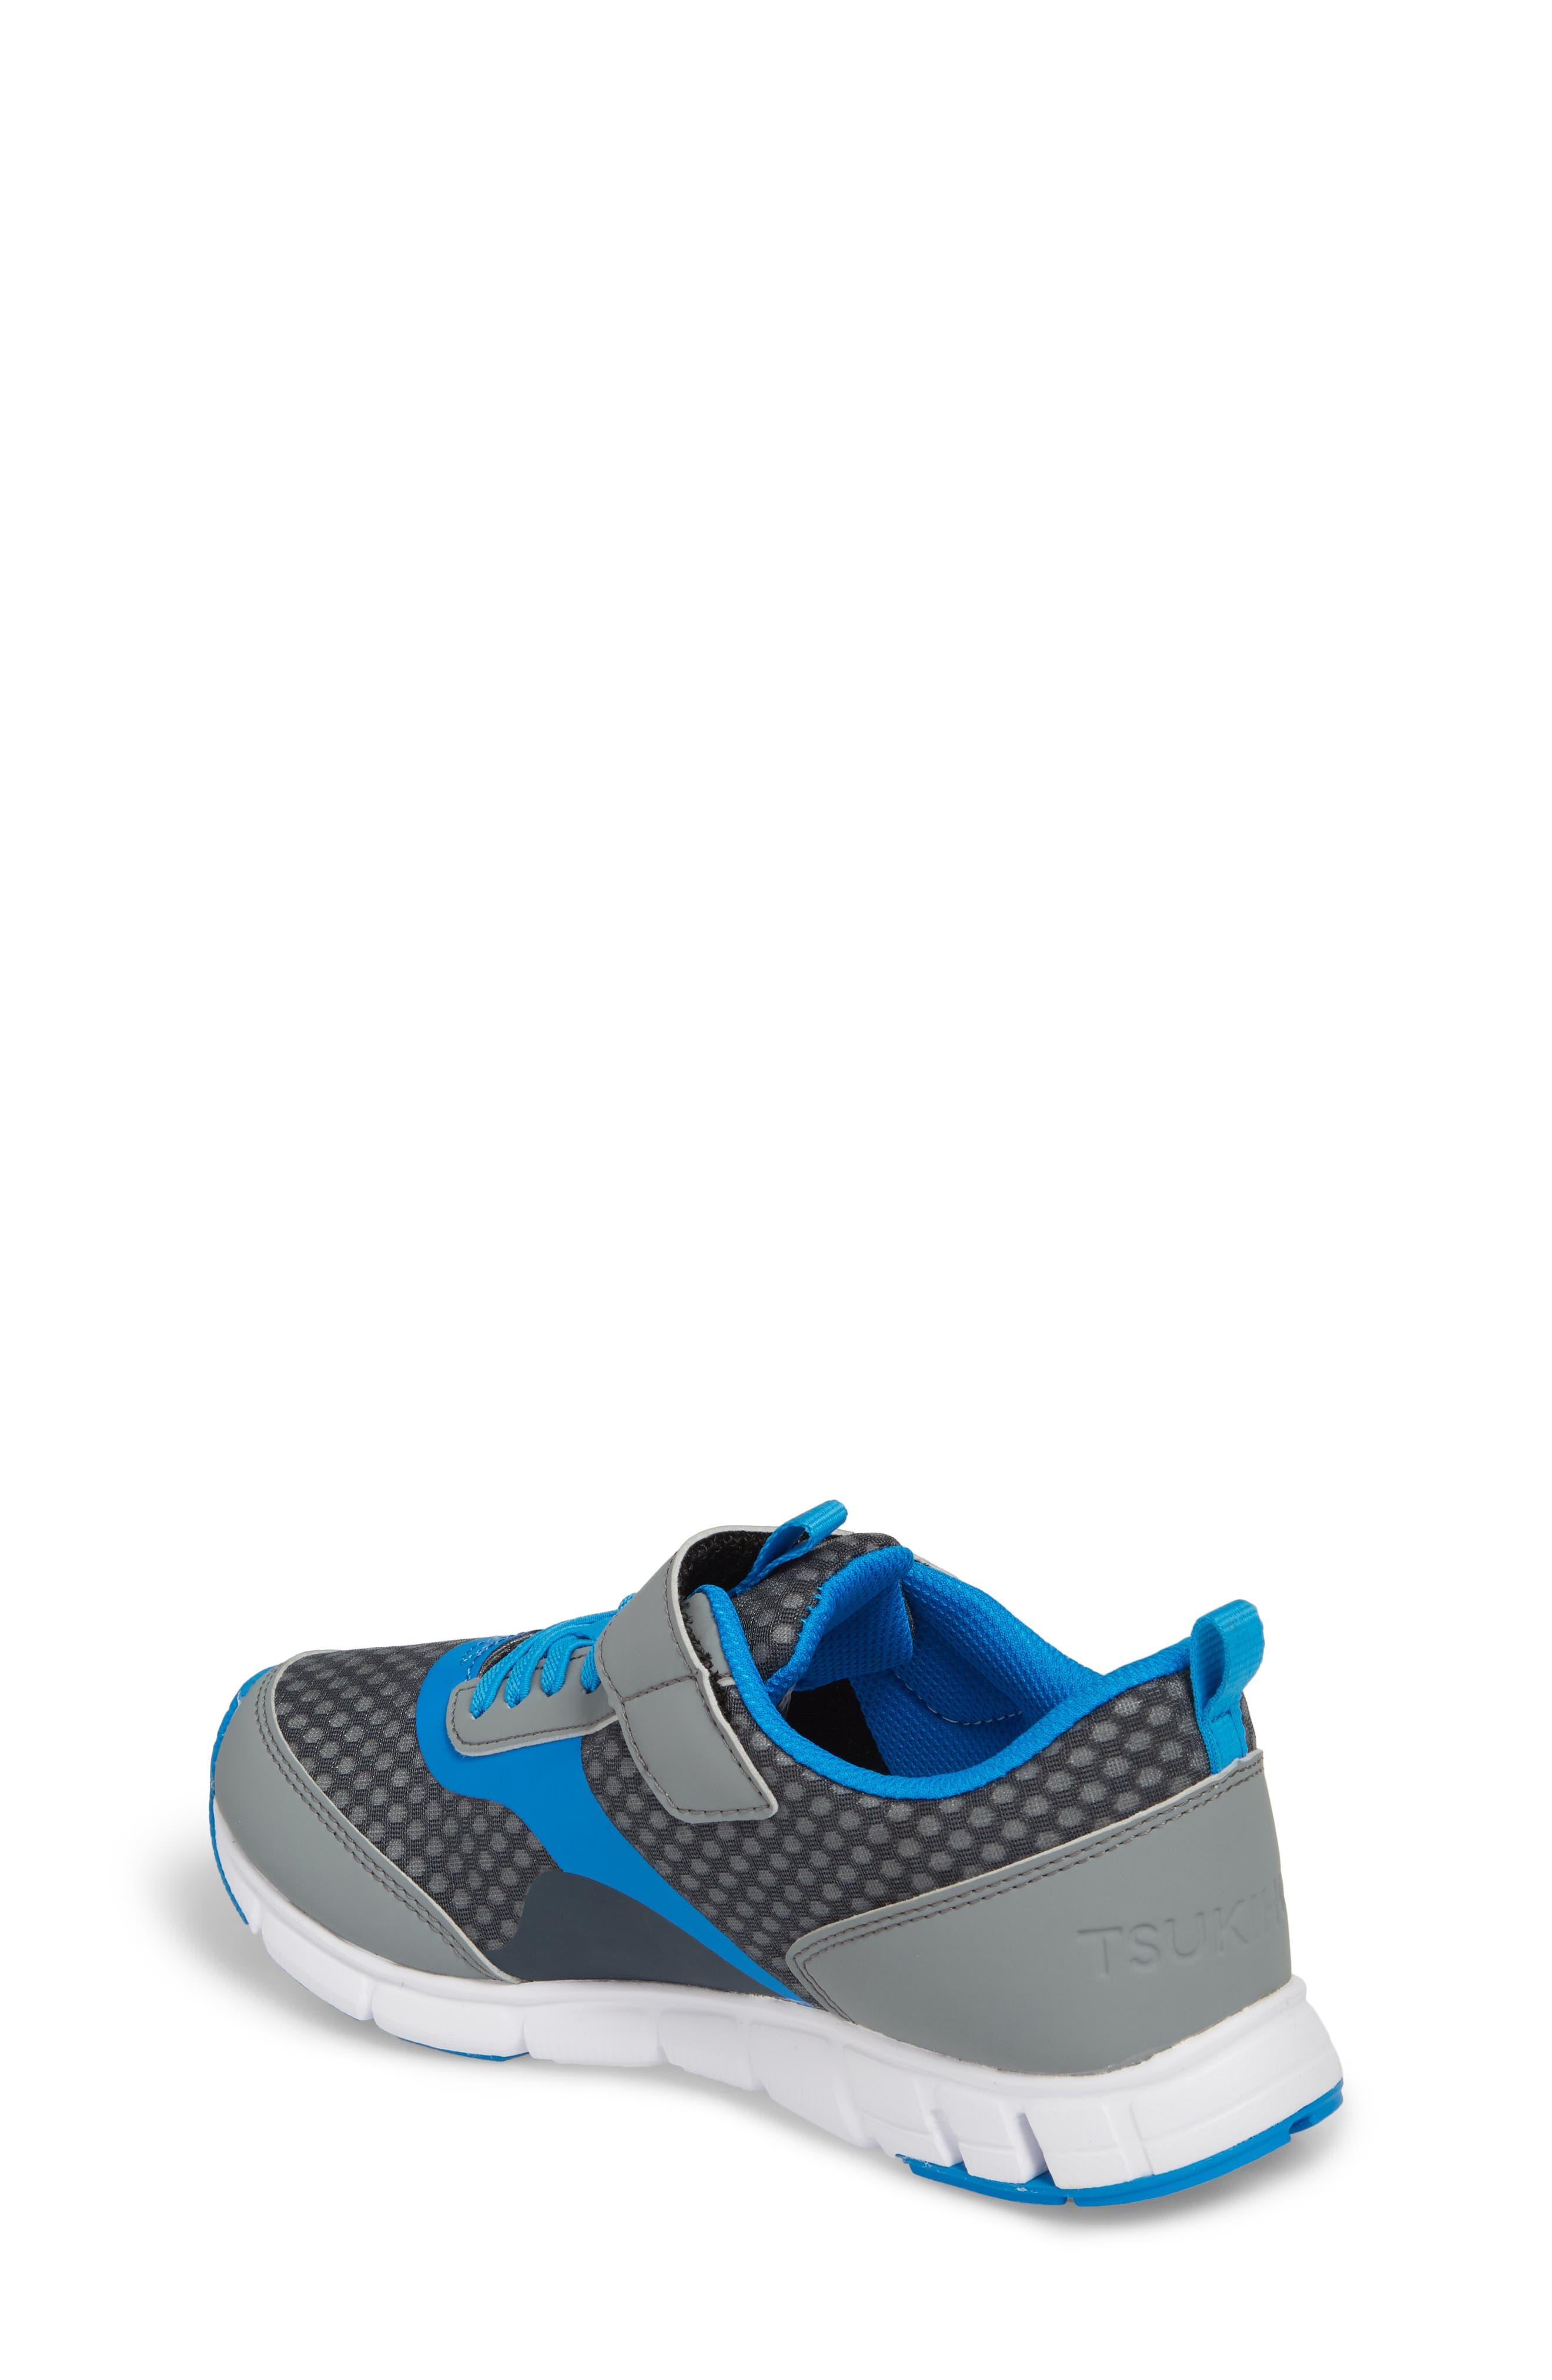 Sonic Washable Sneaker,                             Alternate thumbnail 2, color,                             Gray/ Royal